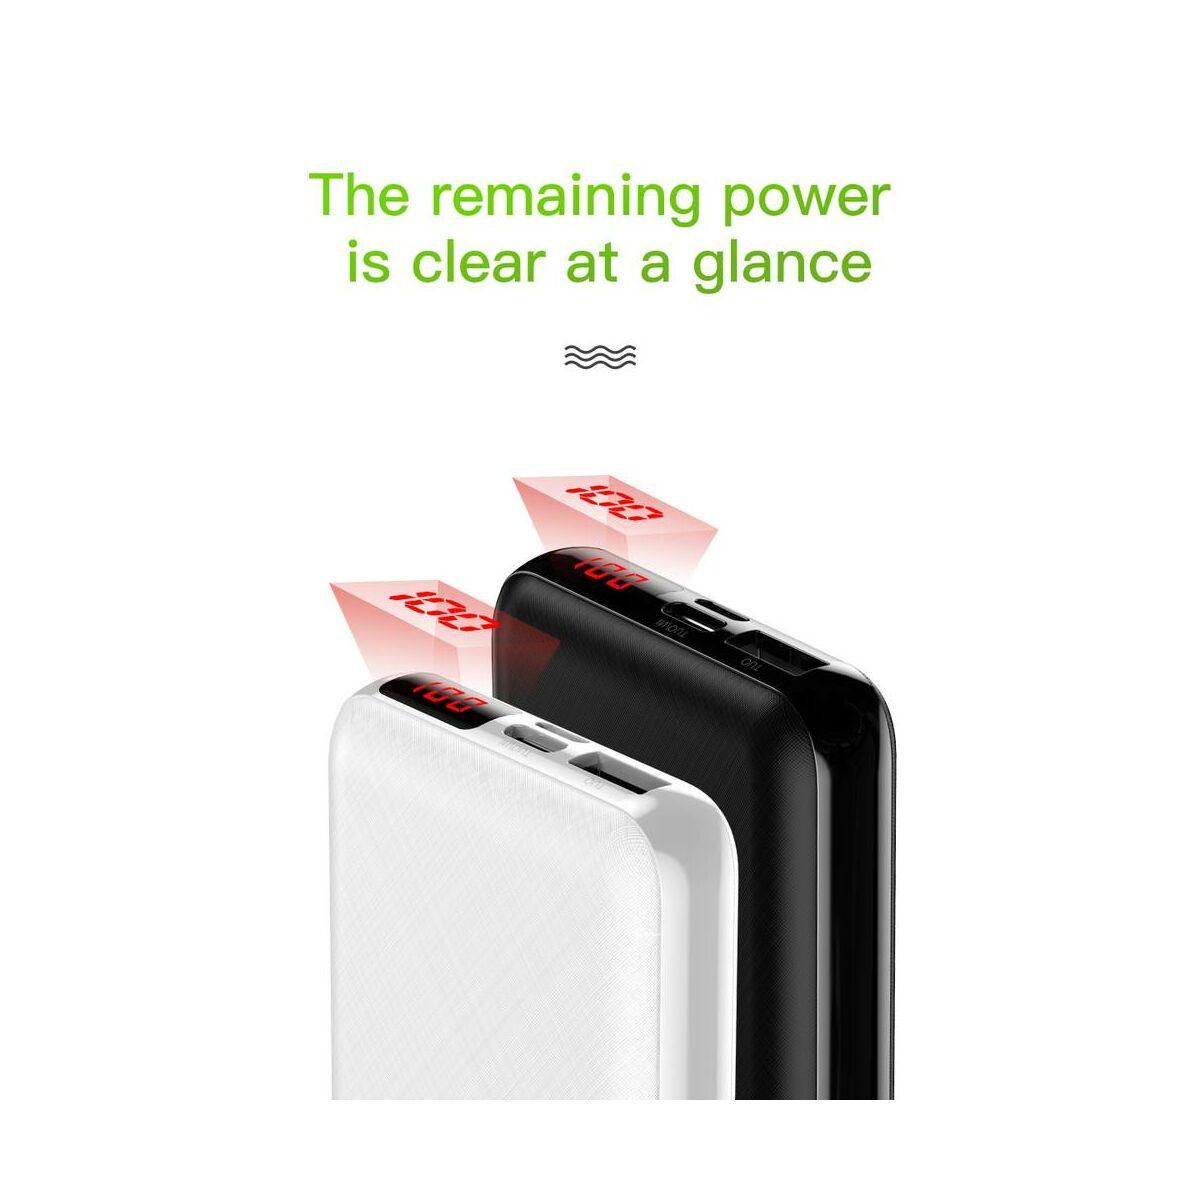 Baseus Power Bank Mini S, digitális kijelző (Type-C + Lightning bemenet / USB + Type-C PD kimenet), 3A, 10.000 mAh, fekete (PPALL-XF01)